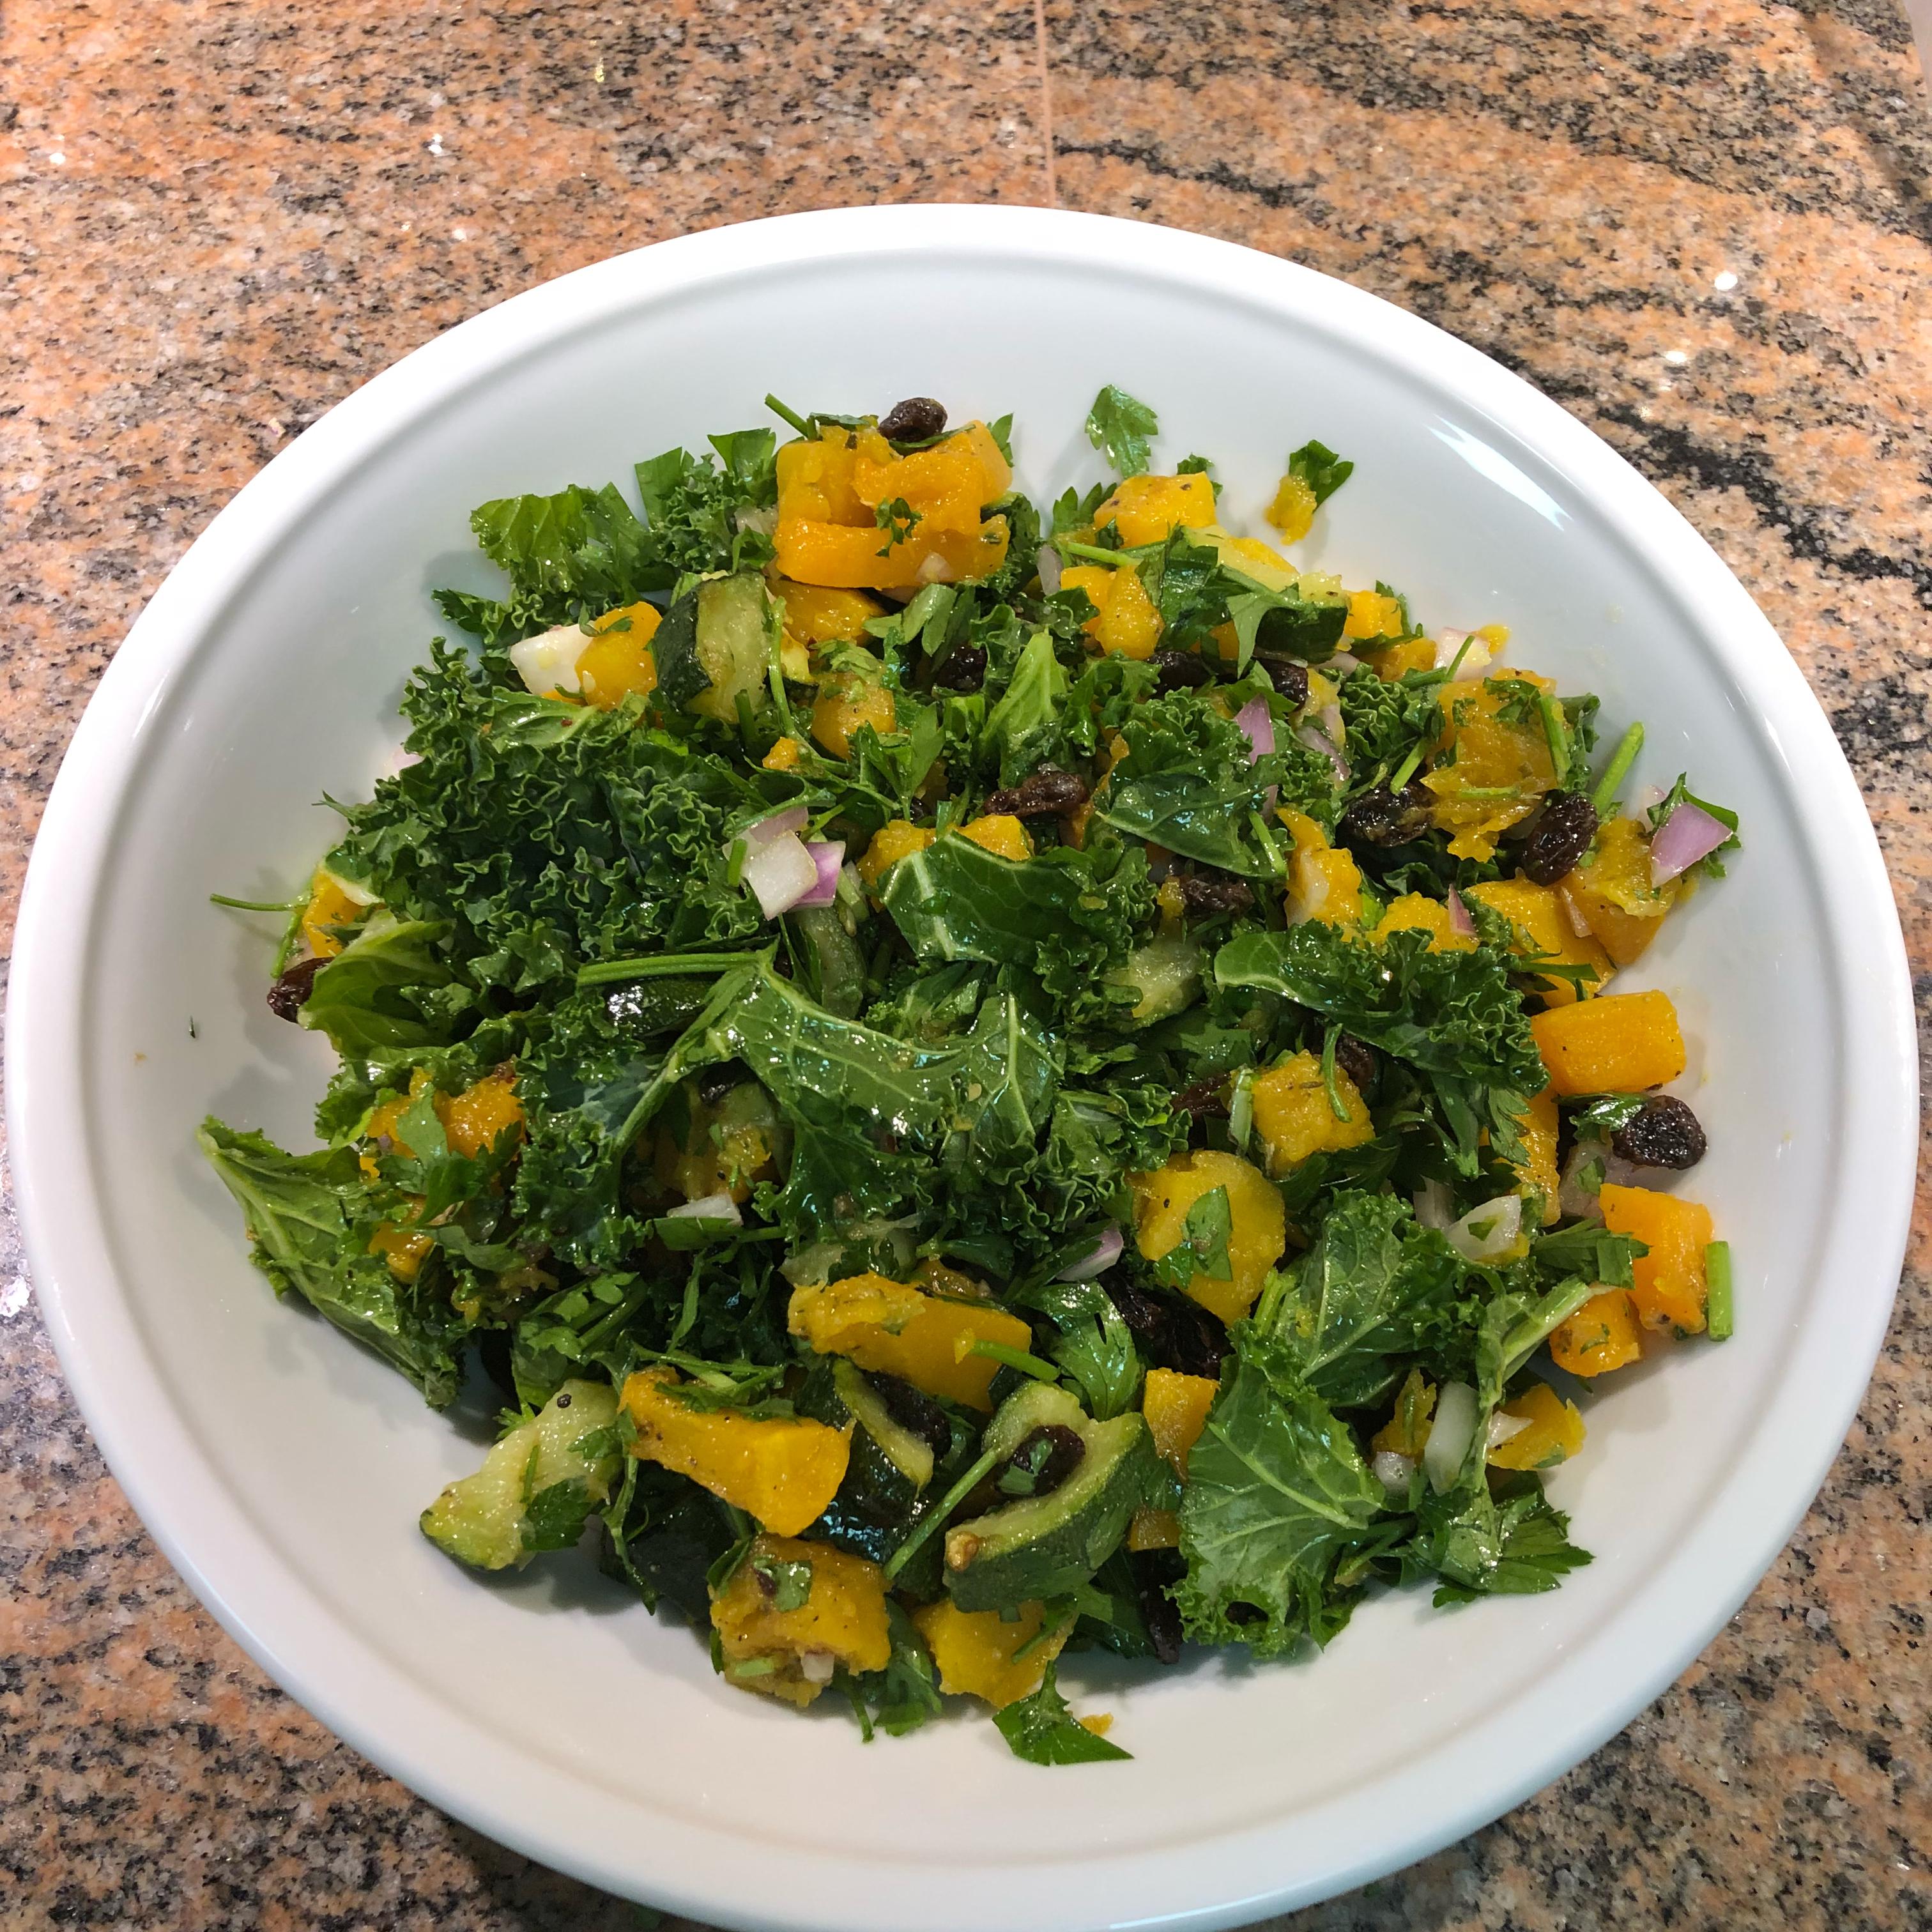 Quinoa, Butternut Squash, and Kale Salad